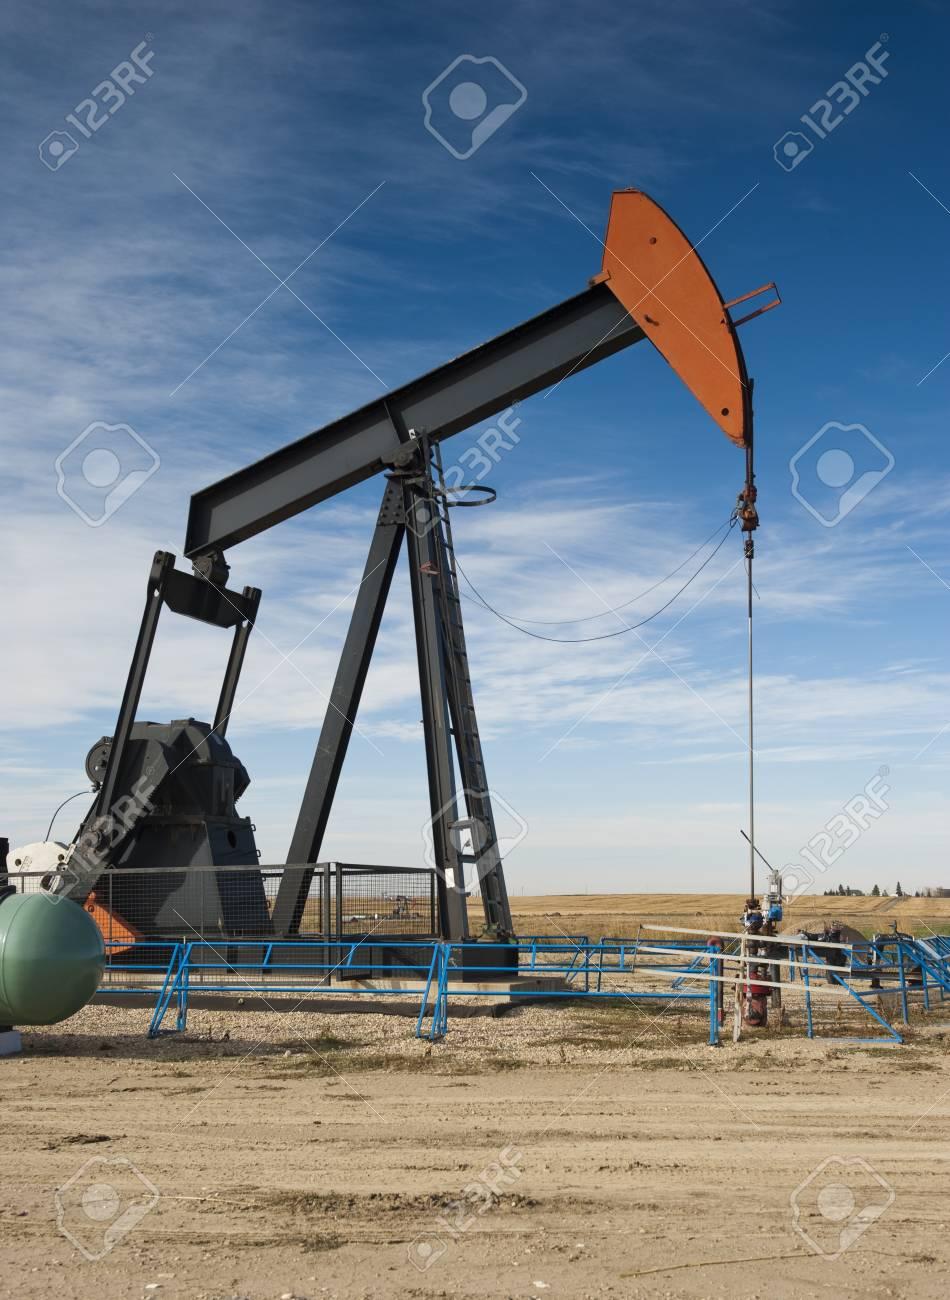 Oil pumpjack on a prairie landscape Stock Photo - 9666259